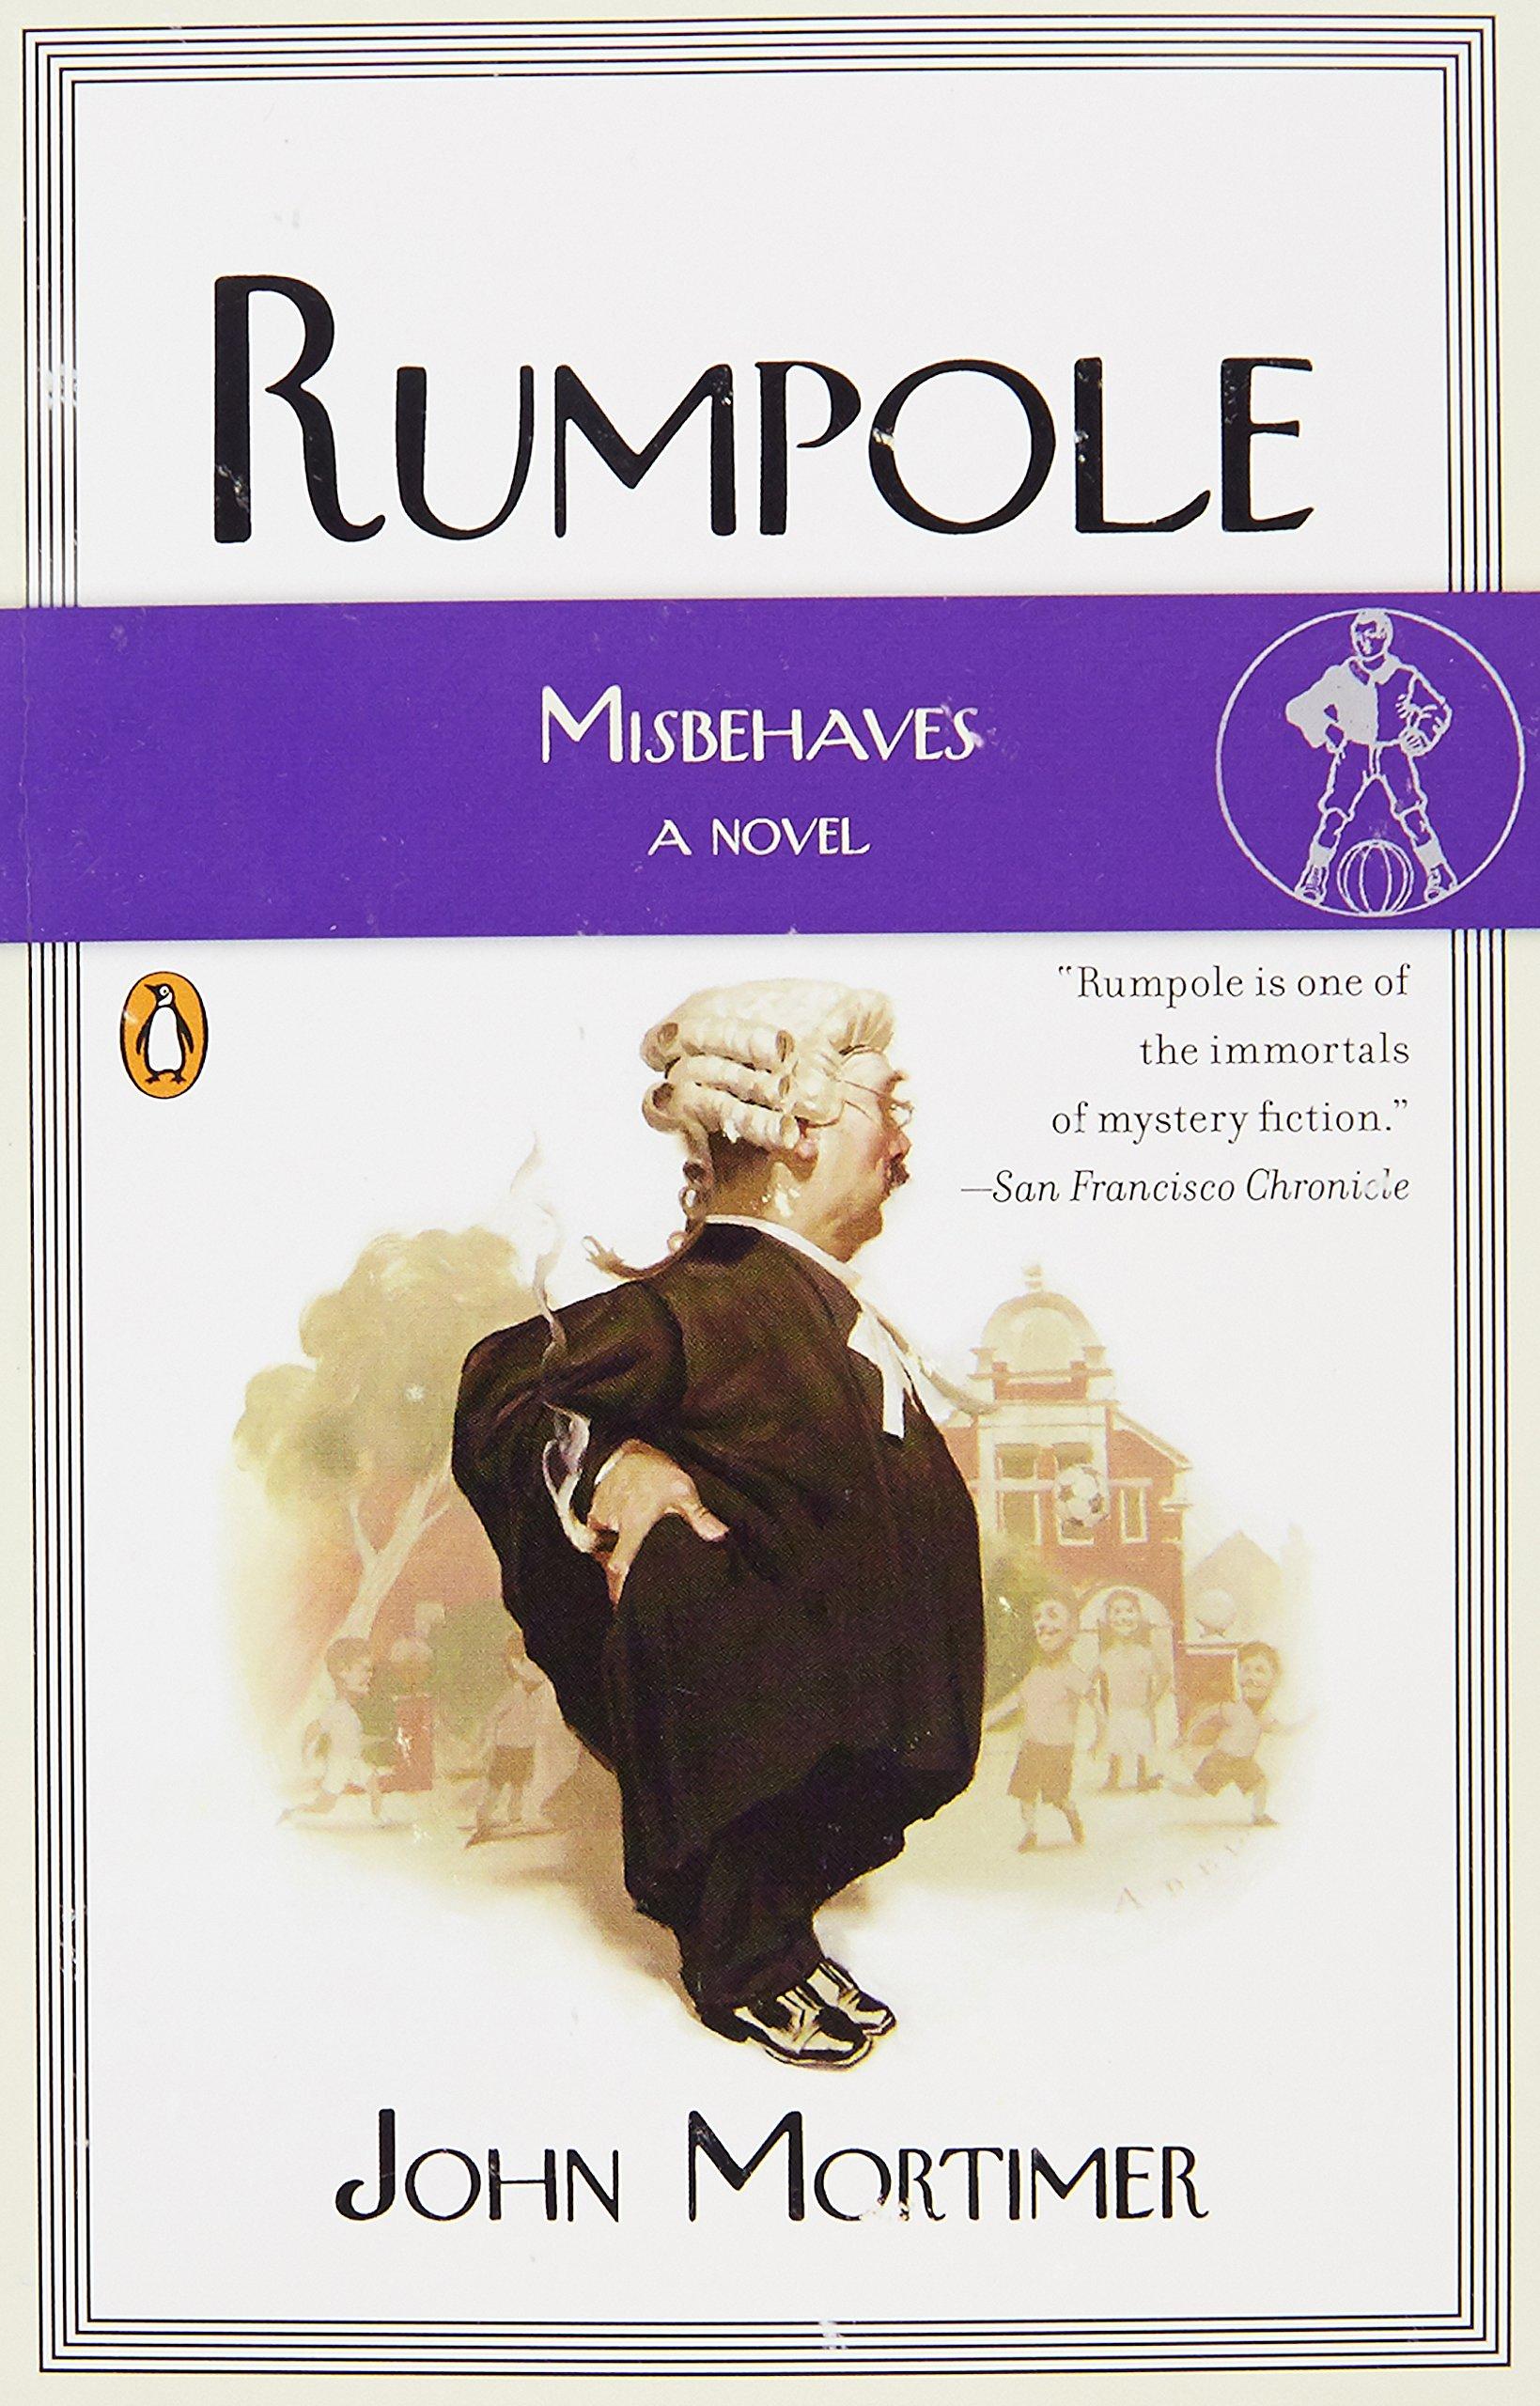 Rumpole Misbehaves John Mortimer 9780143114116 Amazon Books